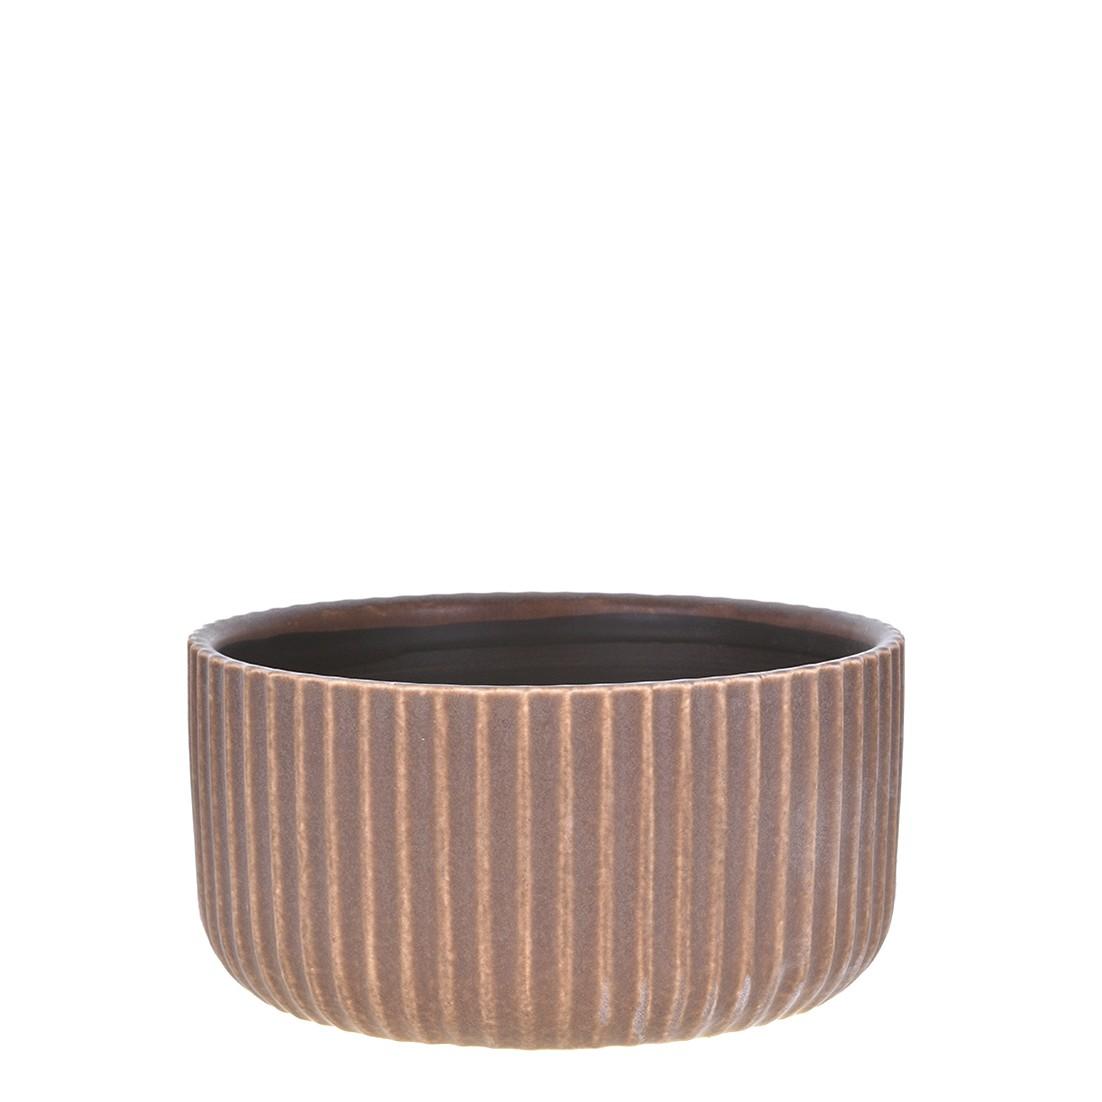 Vaso Decorativo de Ceramica Redondo 19cm Marrom